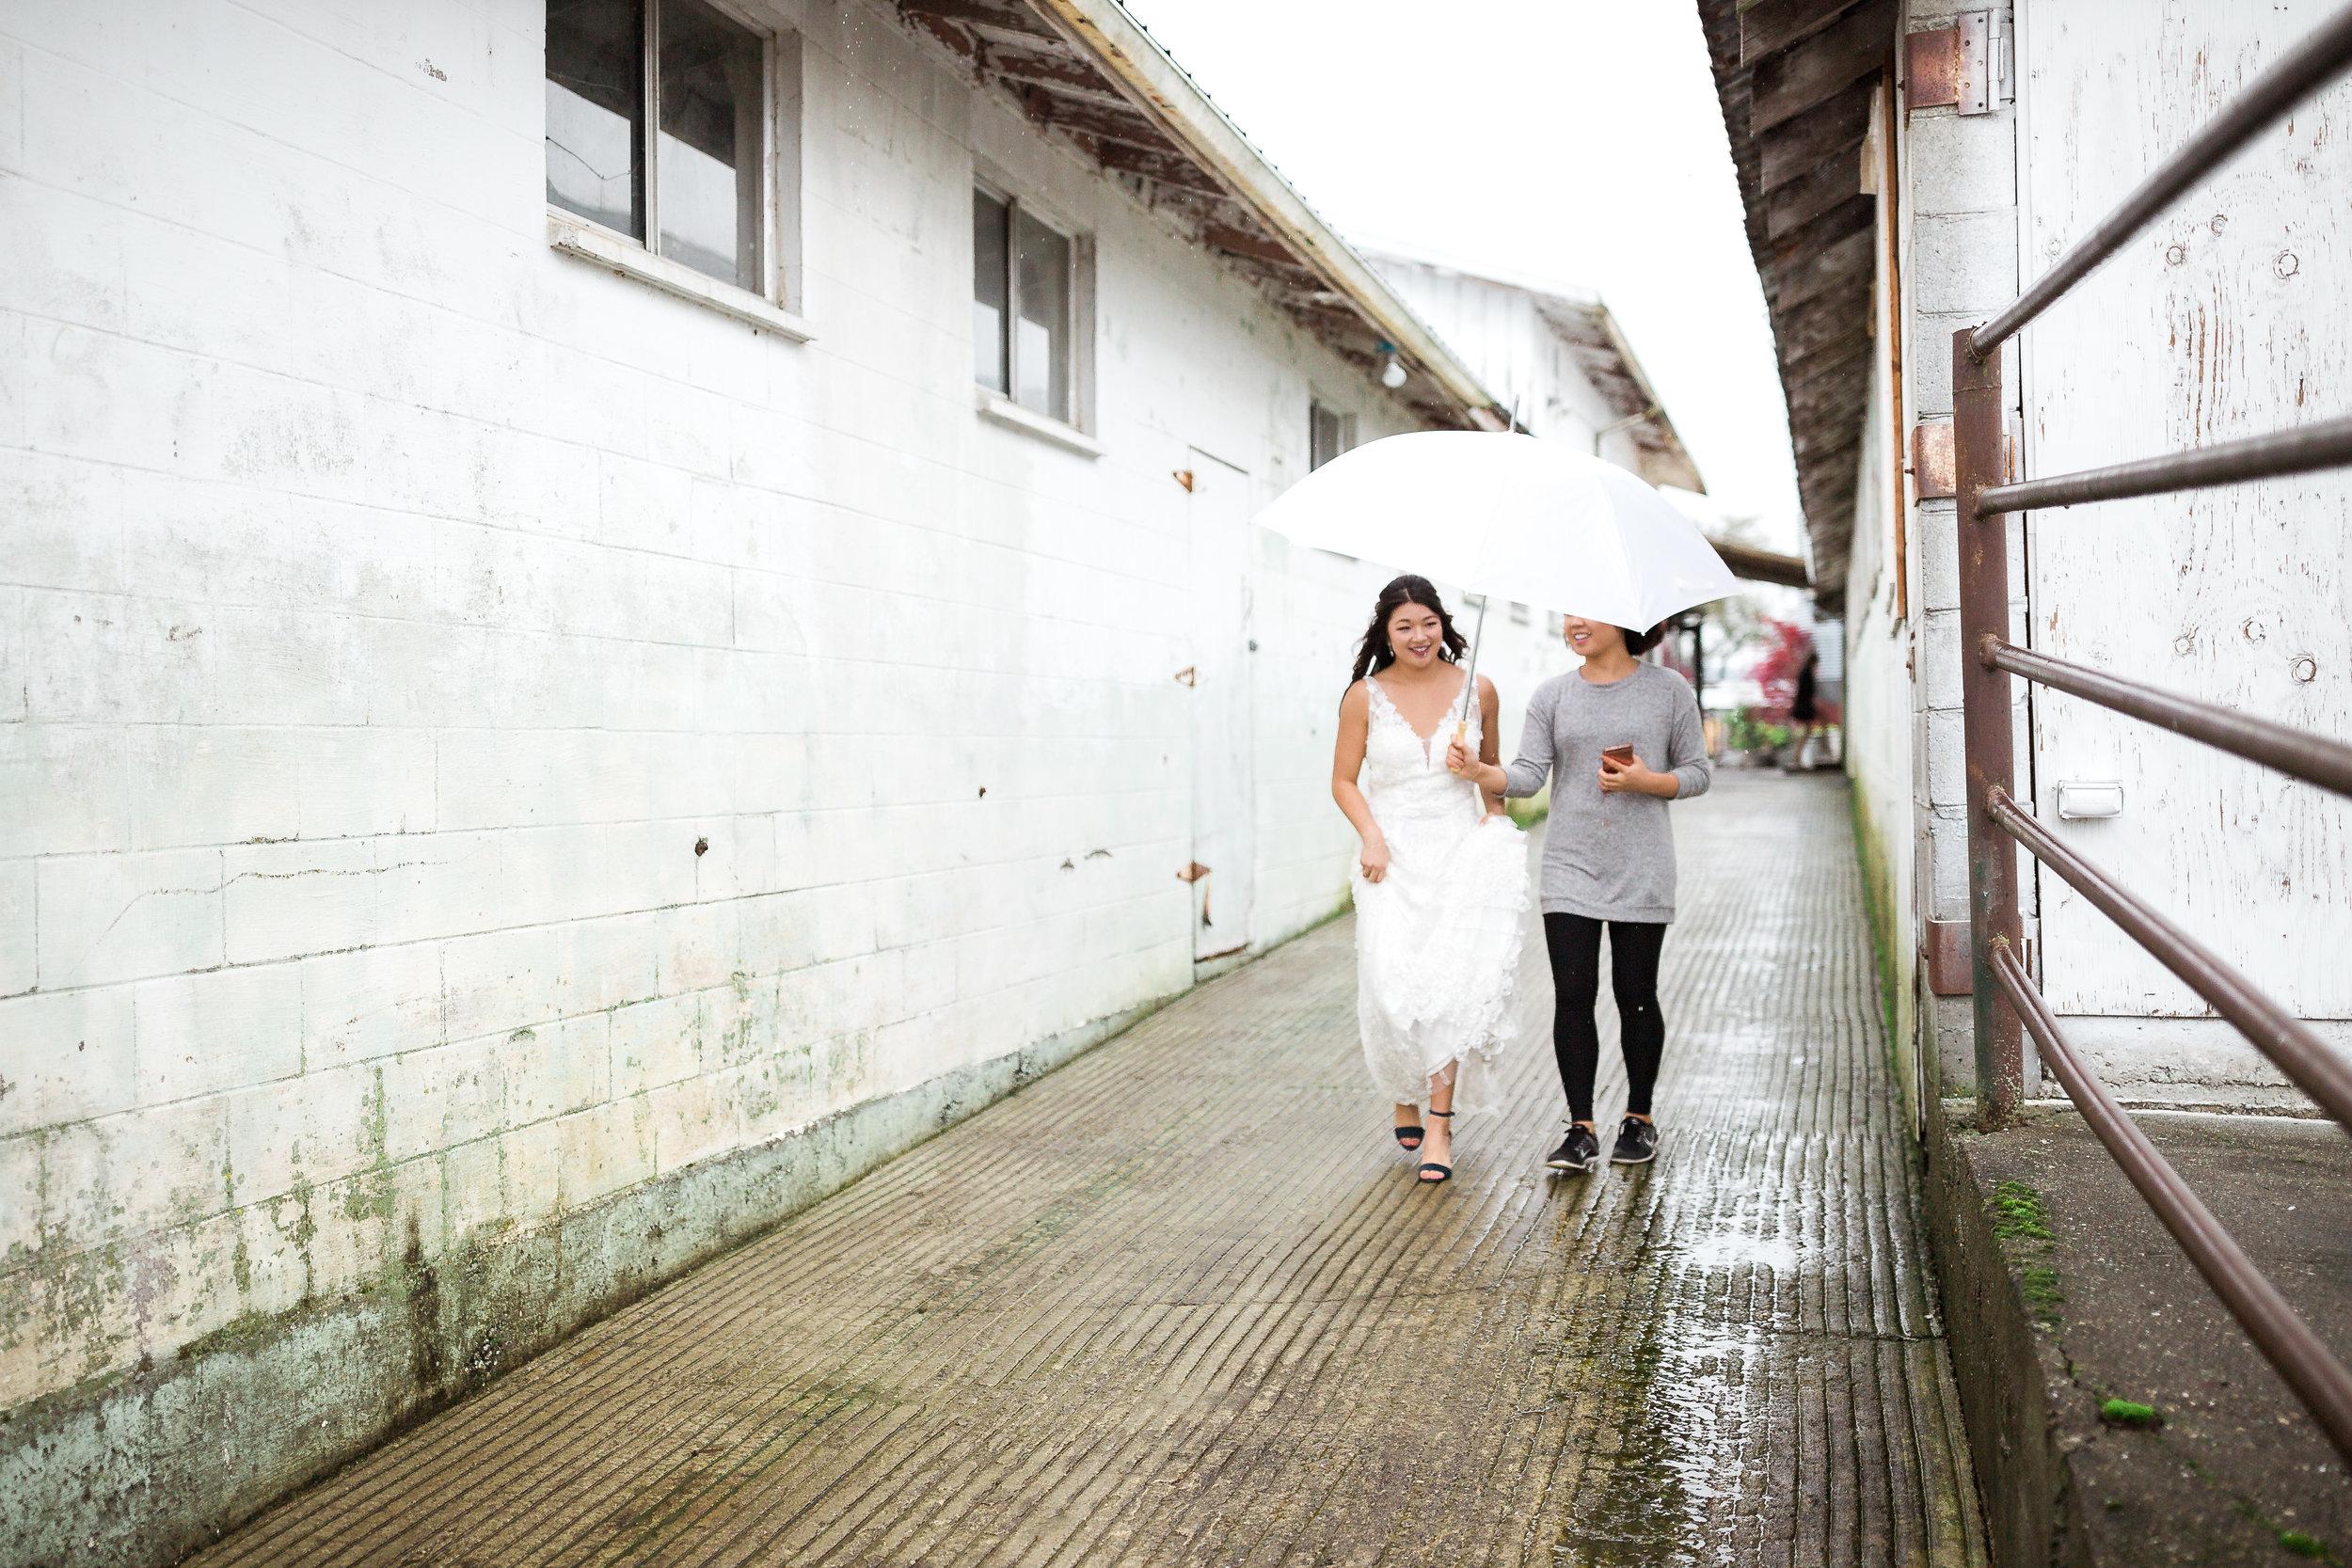 AlessandraArendtPhotography_Copyright2016_Chris-and-Deena_Wedding_HighResolution-224.jpg